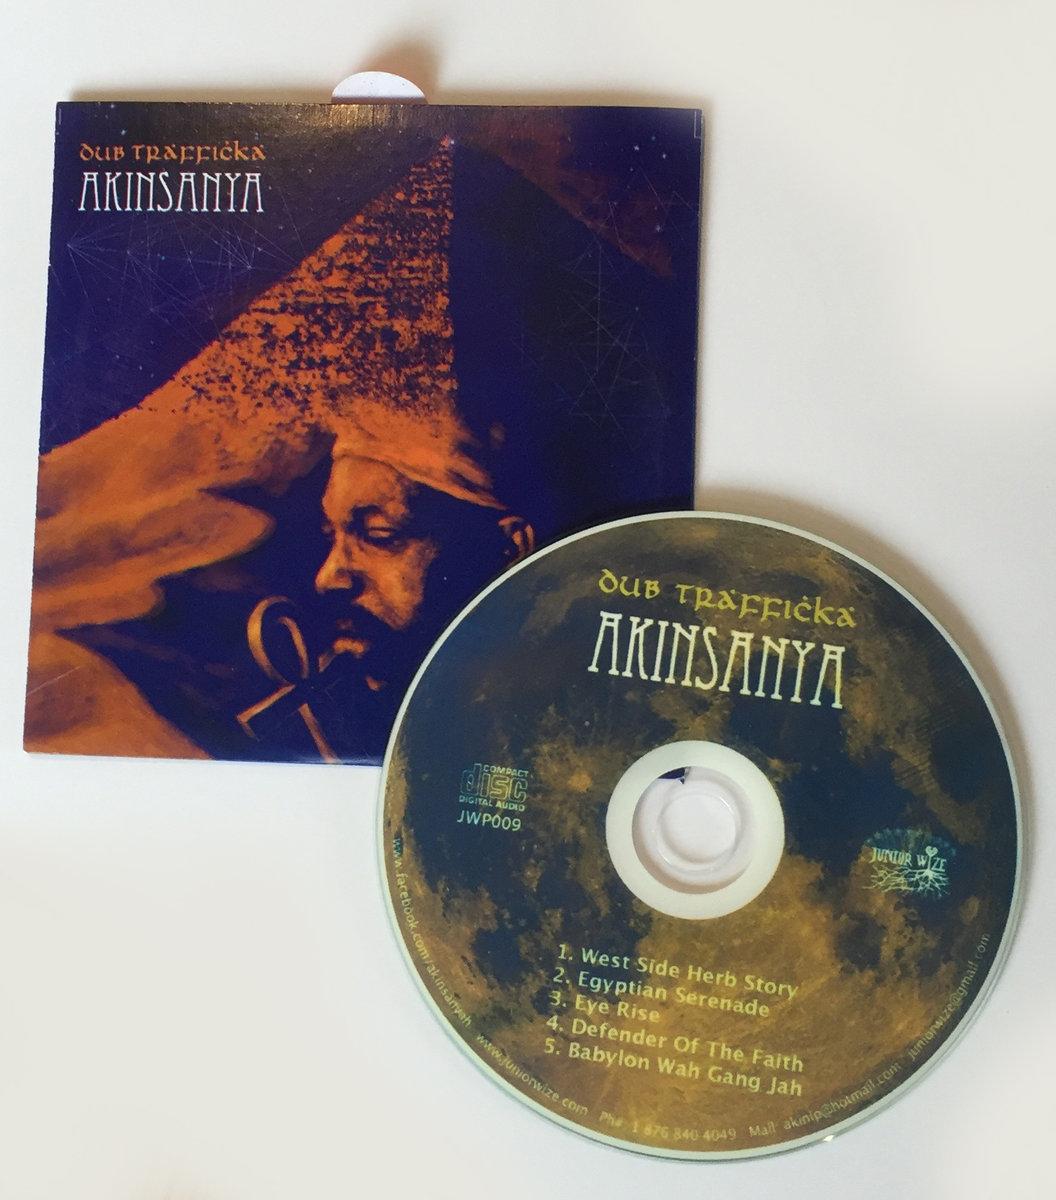 Akinsanya - Dub Trafficka (Jamaica Edition)